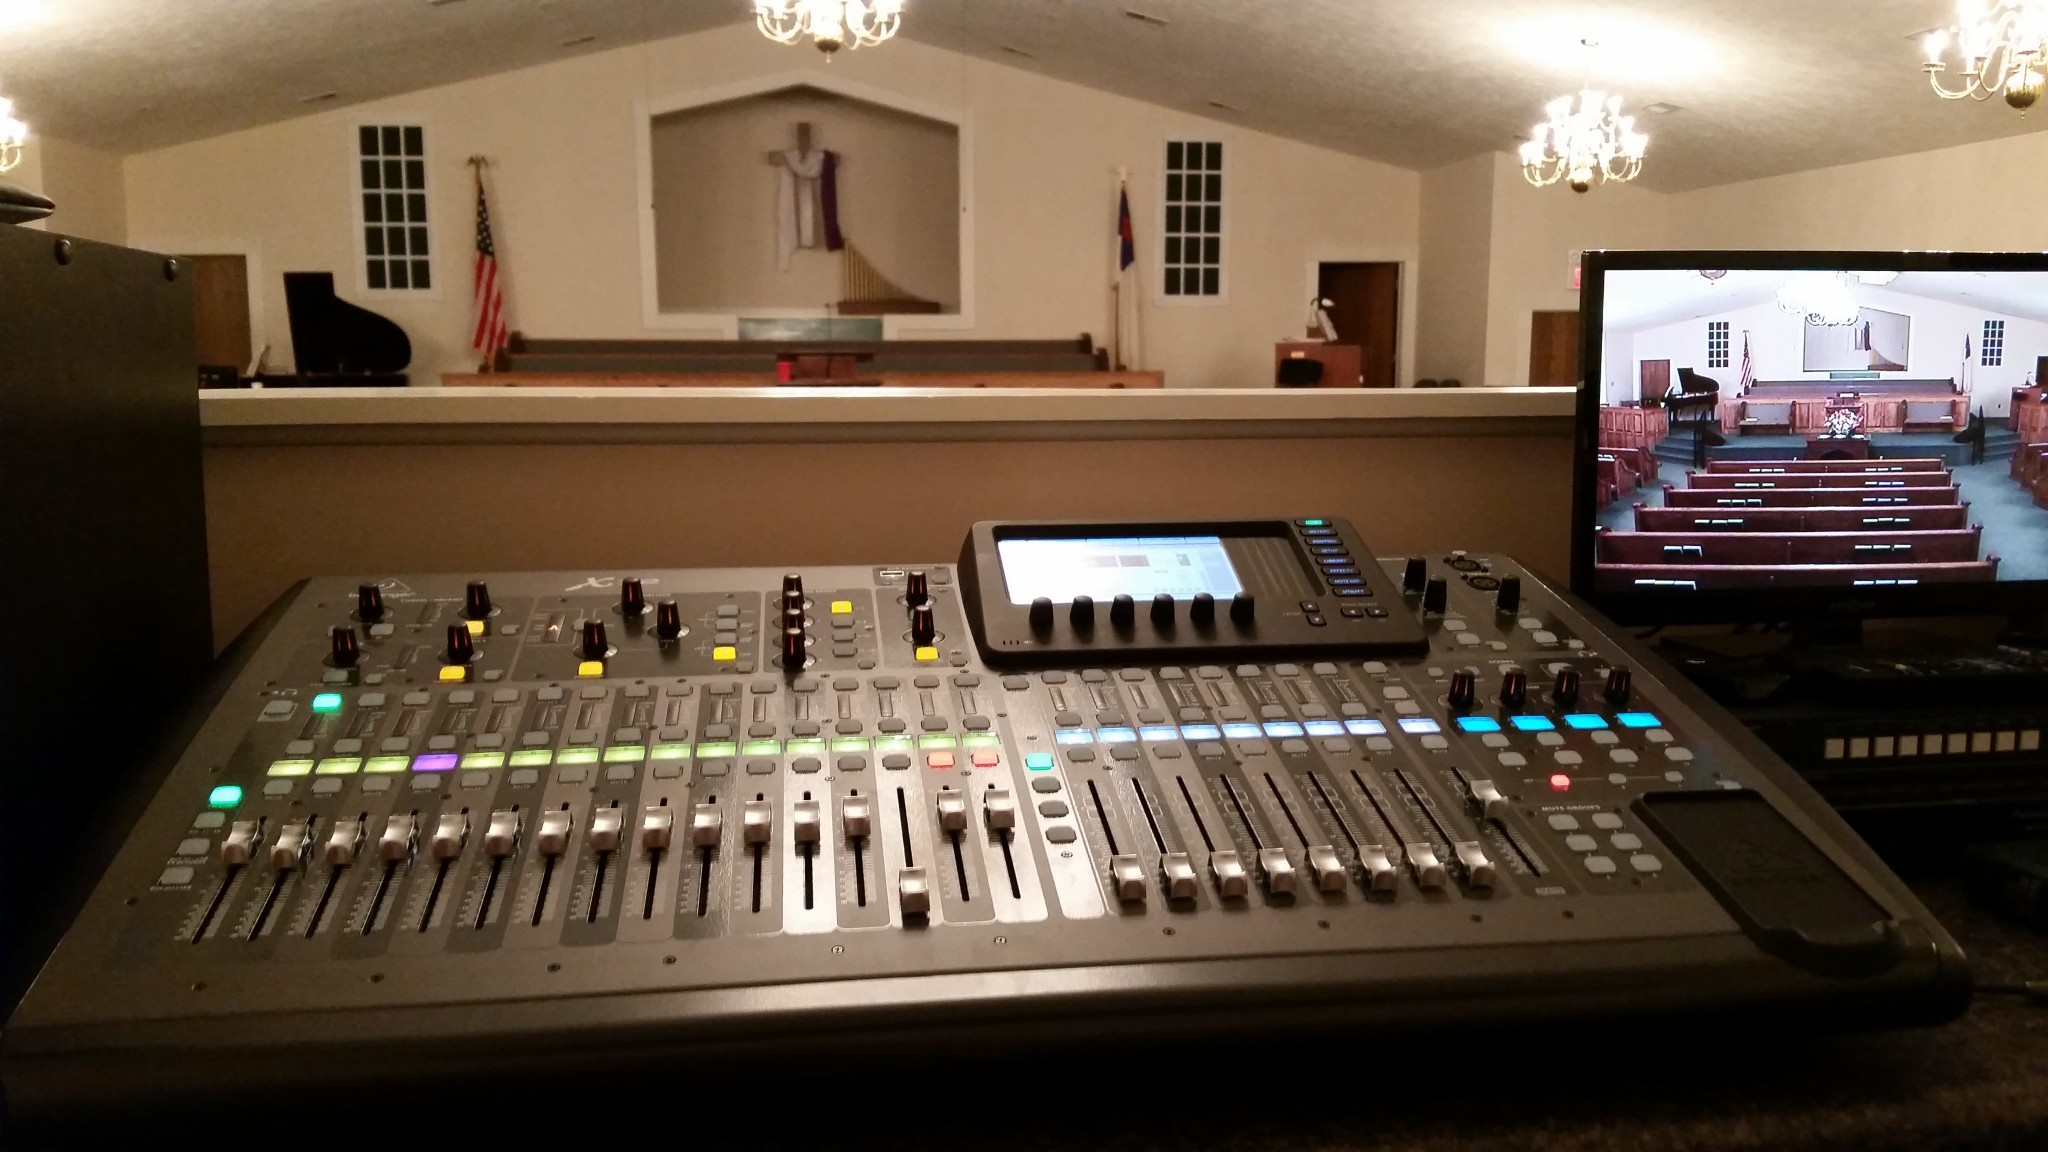 Big Screen Audio Visual Systems